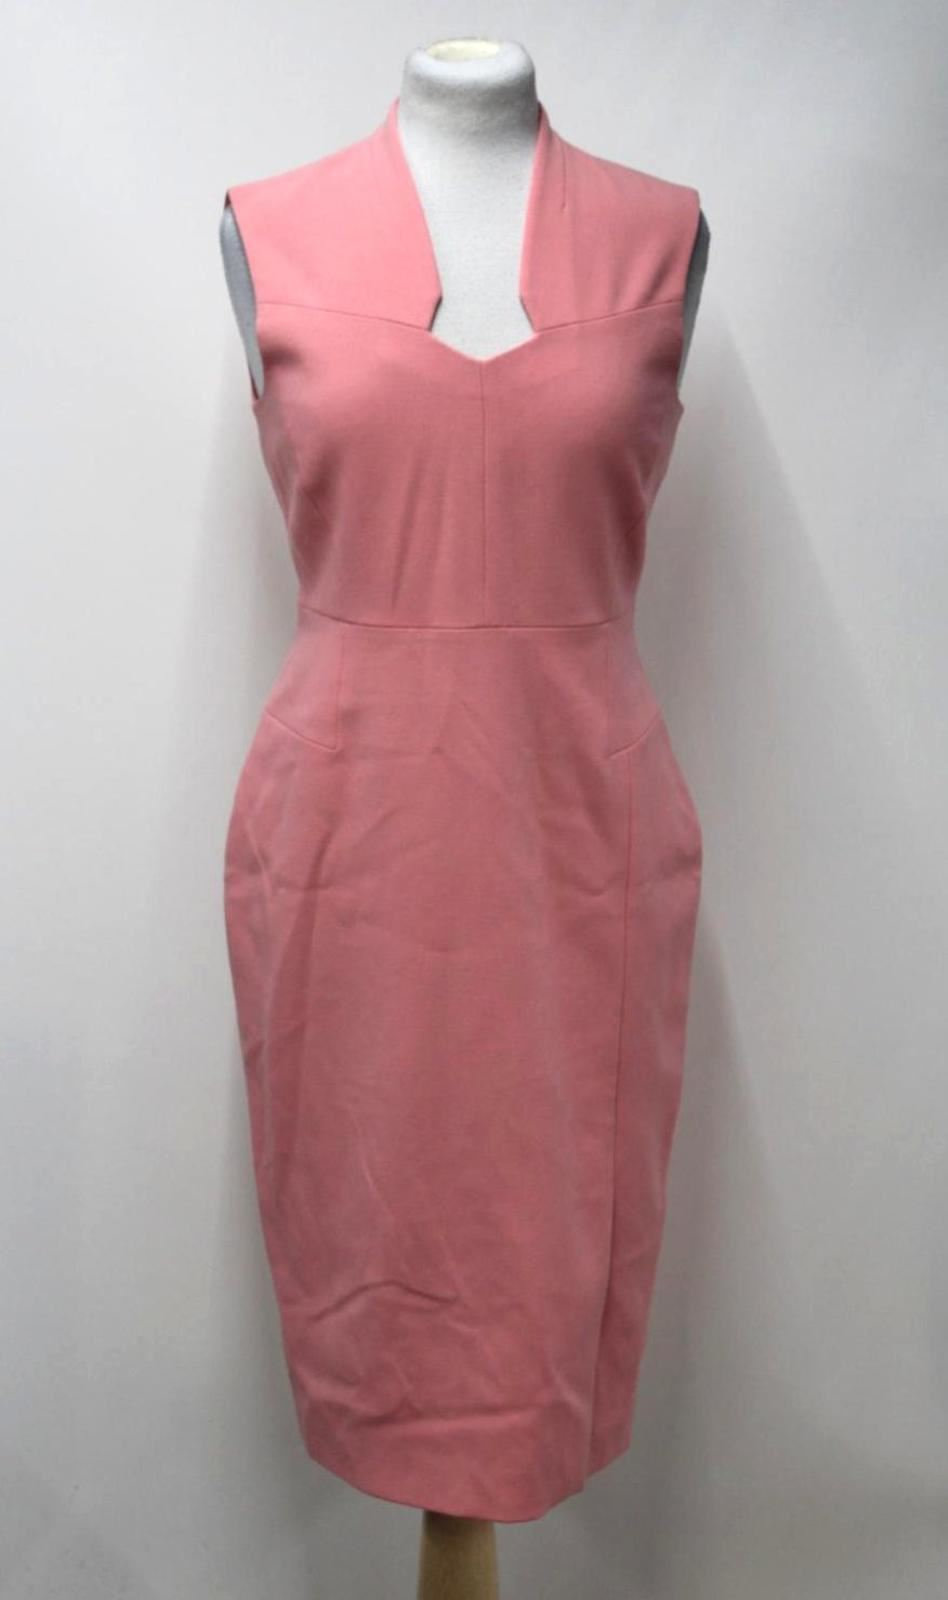 L-K-BENNETT-Ladies-Dr-Dendra-Pink-Geometric-Neckline-Knee-Length-Dress-UK12